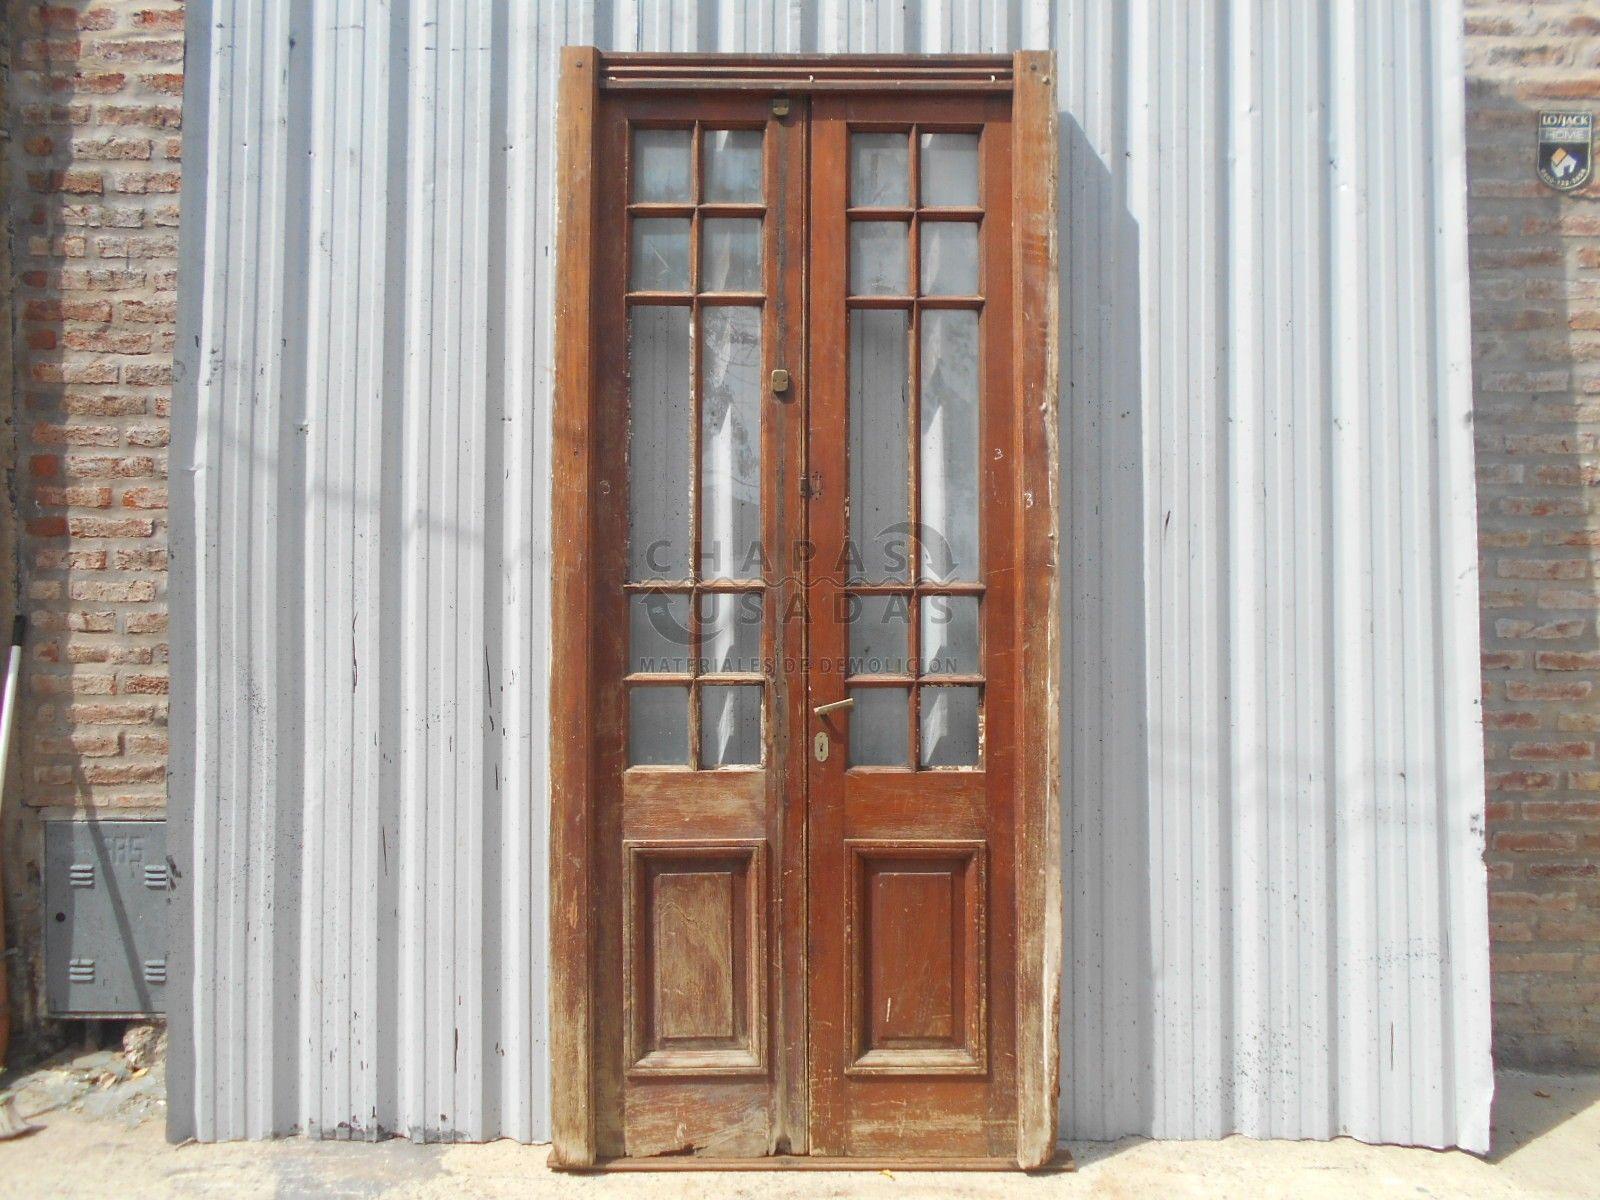 Antigua puerta cancel de madera en cedro | puertas | Pinterest ...